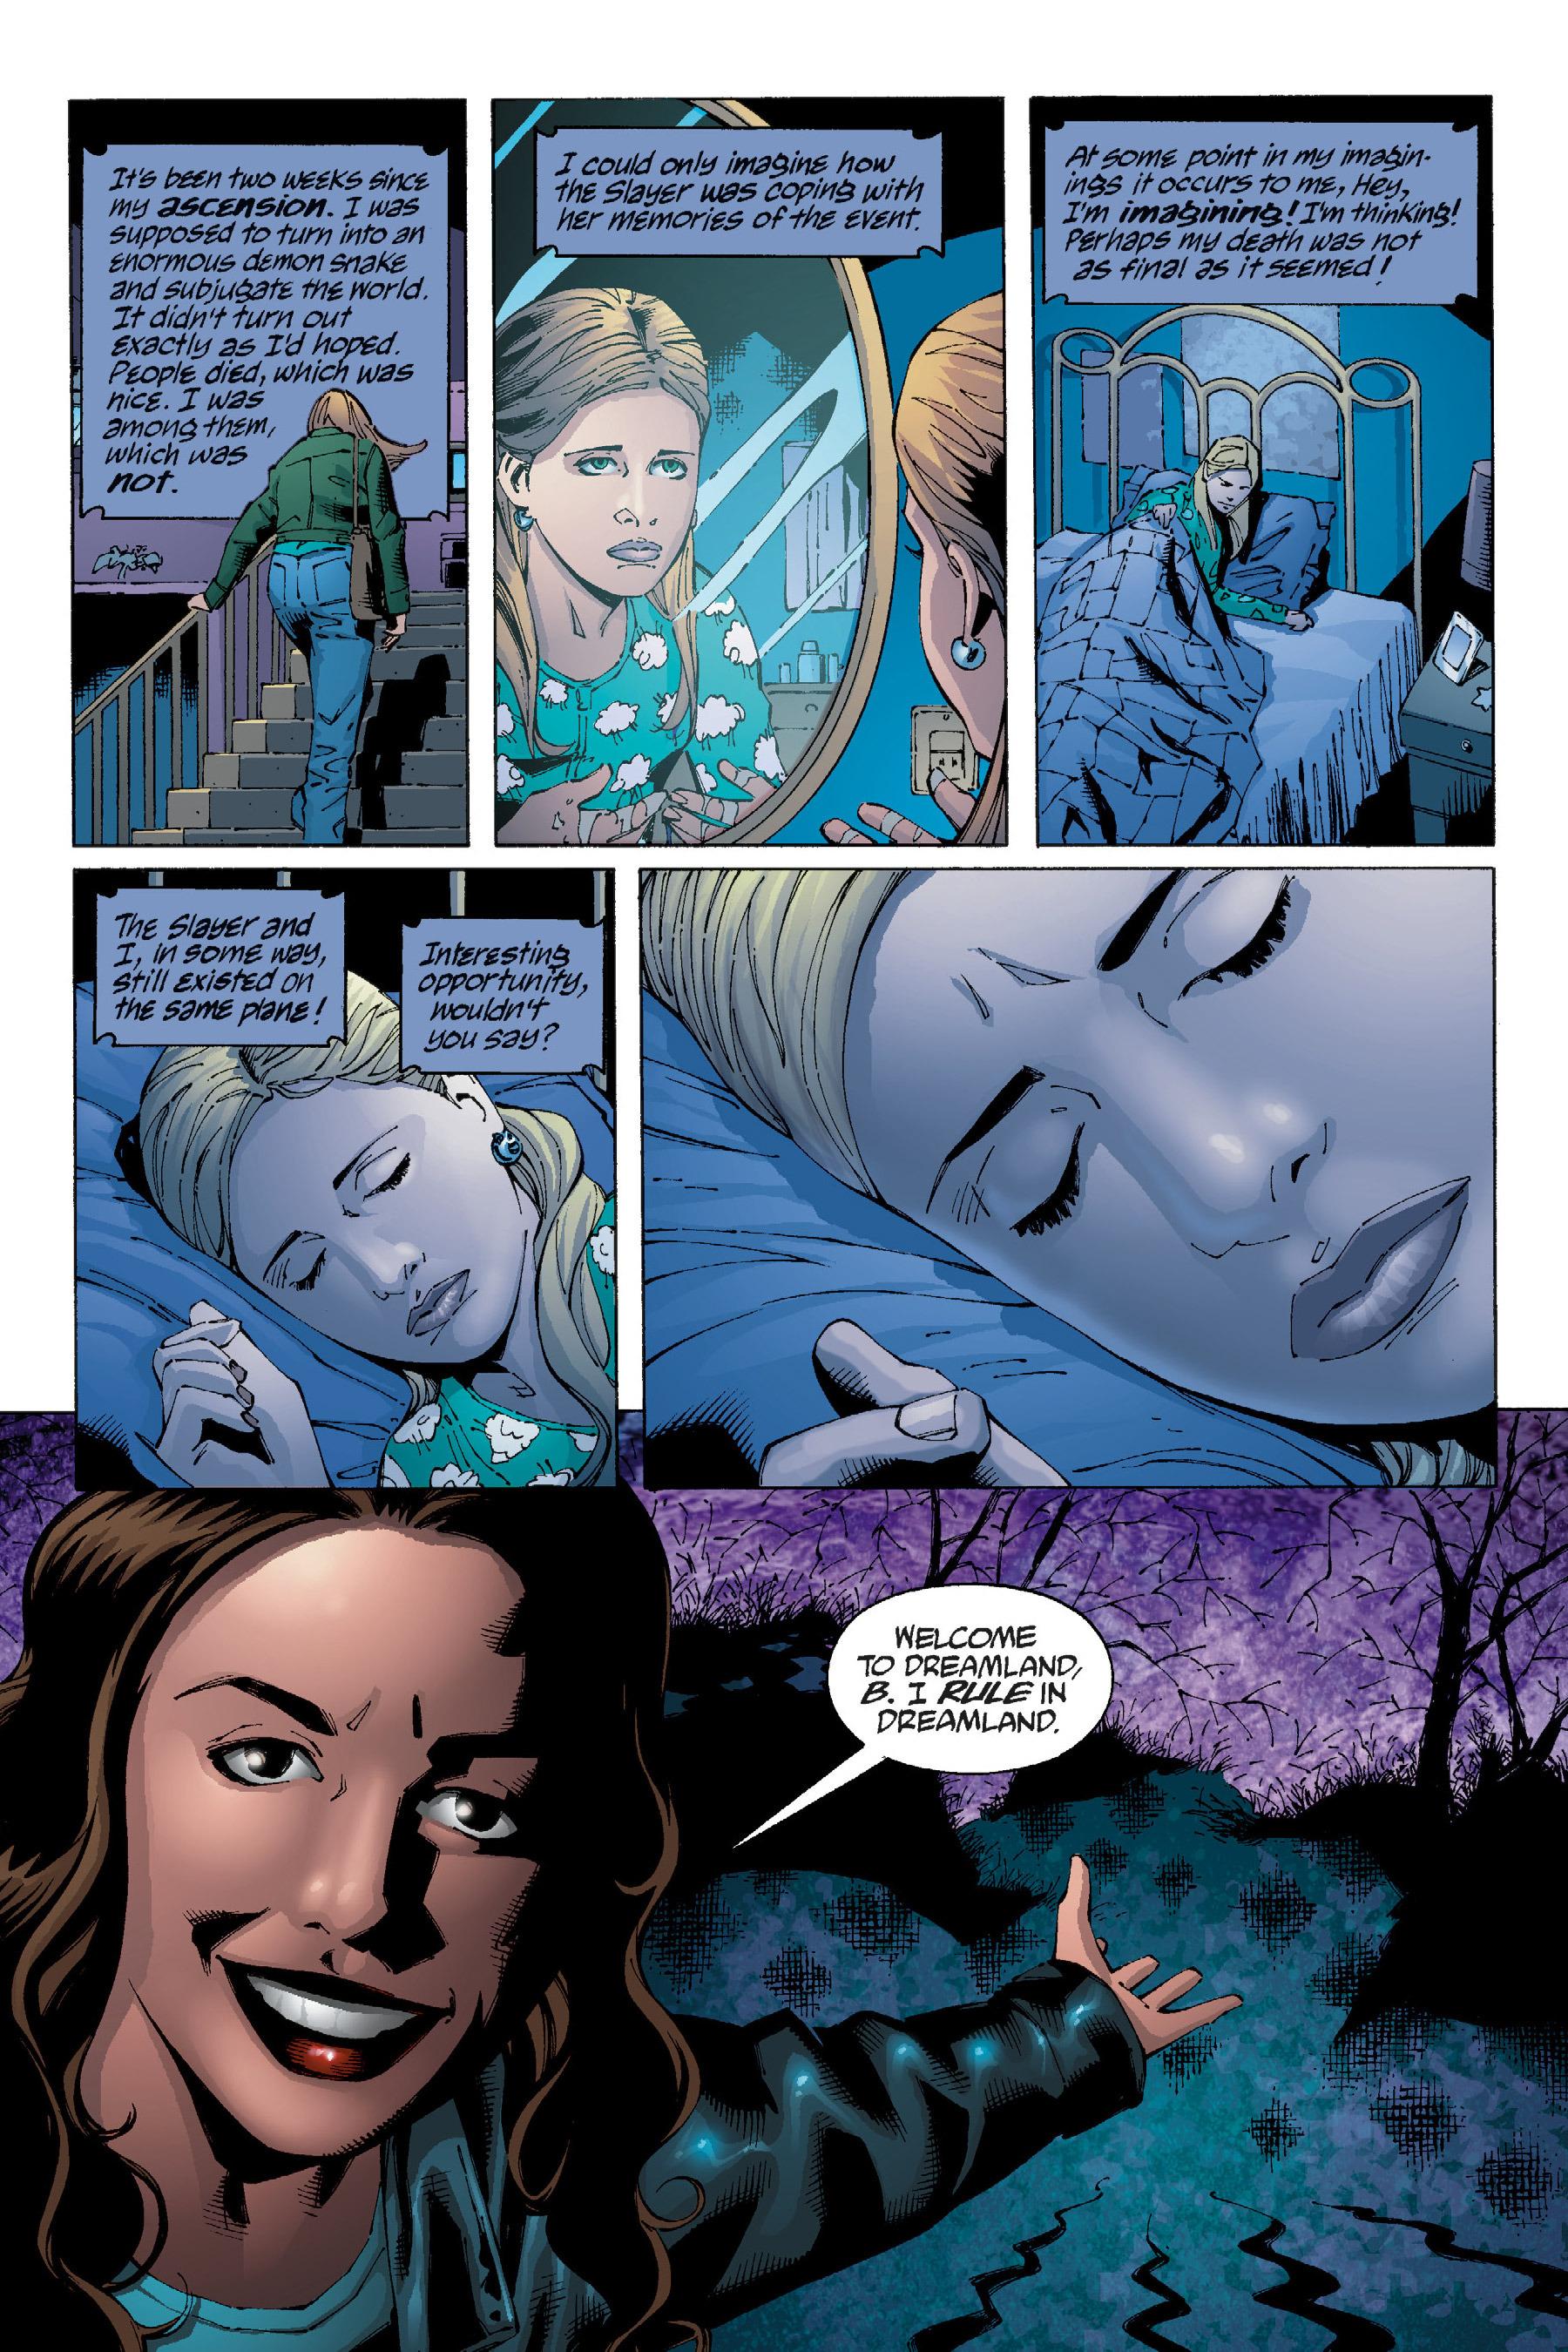 Read online Buffy the Vampire Slayer: Omnibus comic -  Issue # TPB 5 - 13